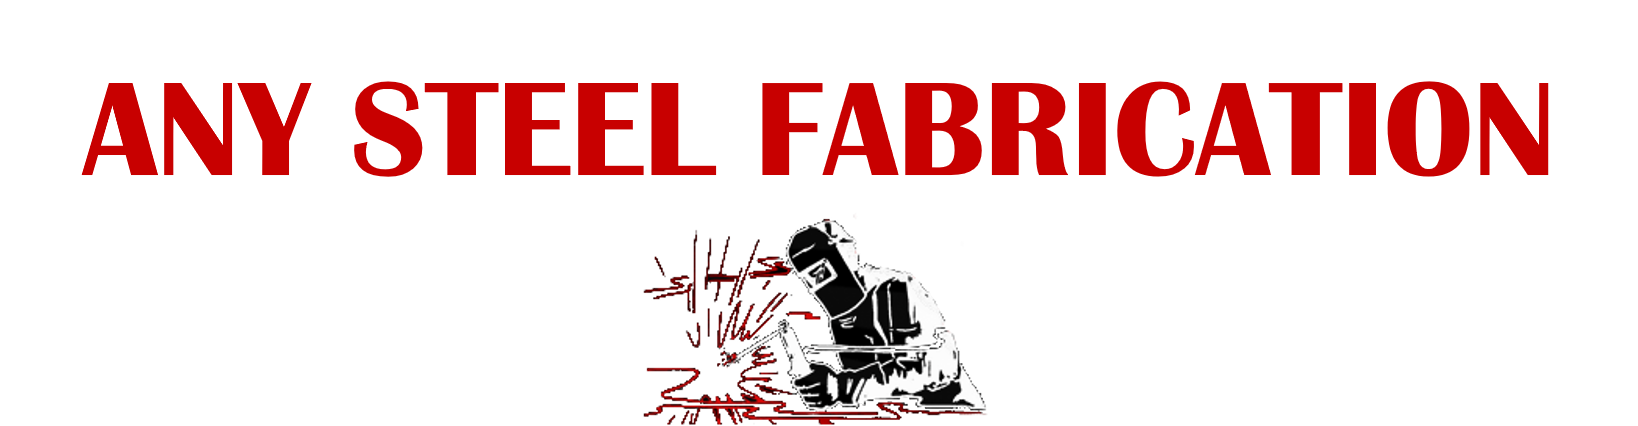 Any Steel Fabrication